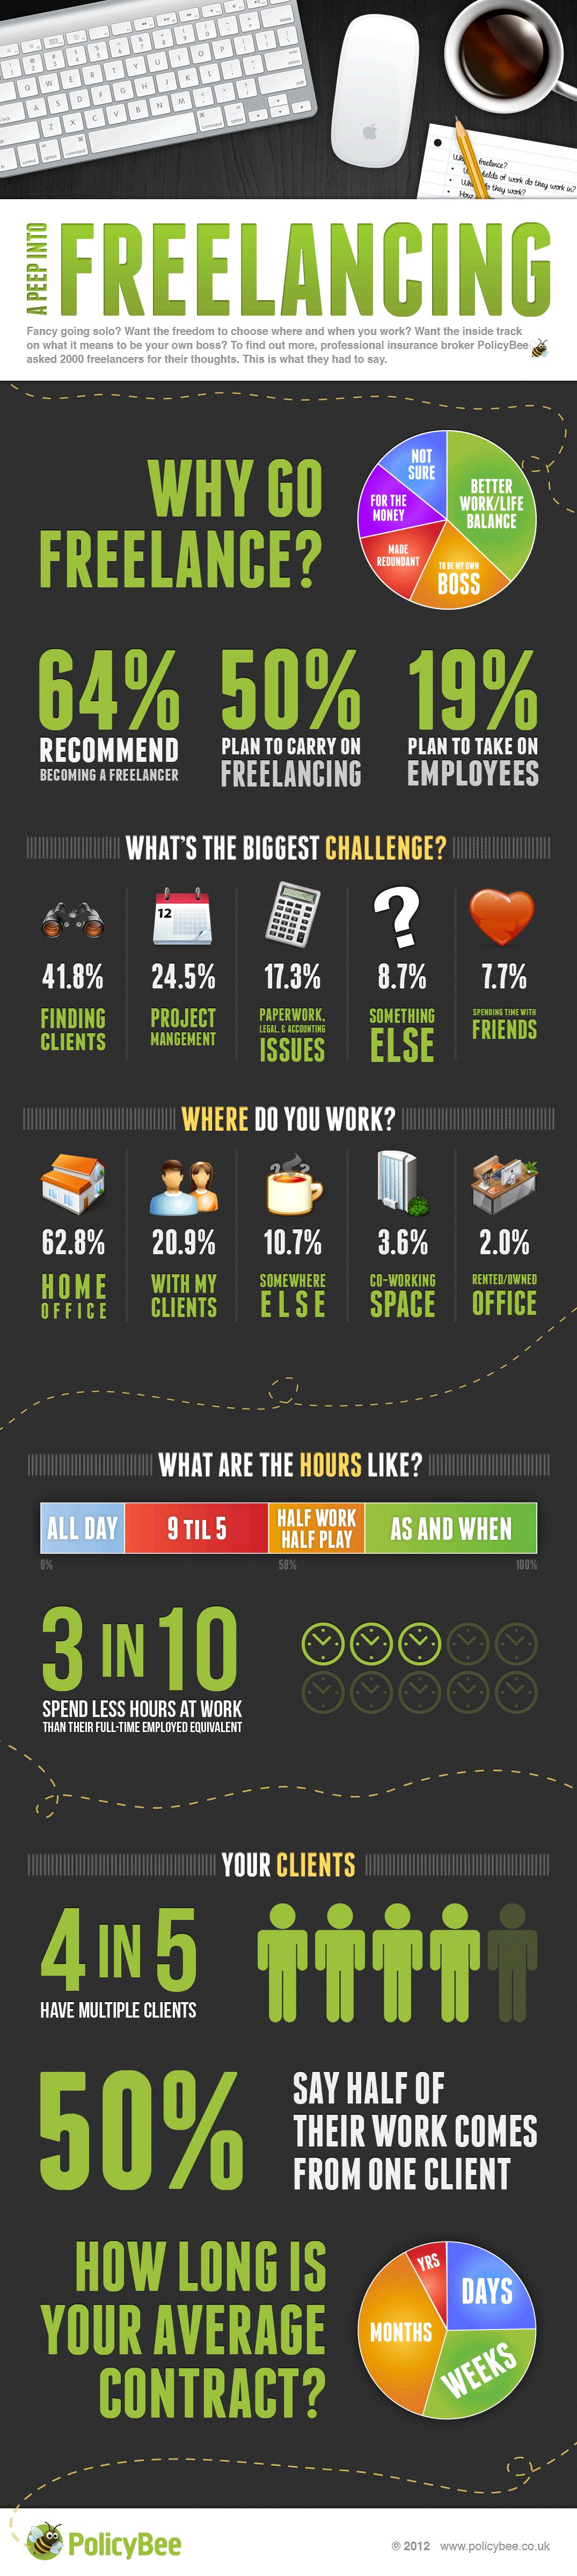 Freelancers On Freelancing Infographic Churchmag Infographic Freelancing Jobs Freelance